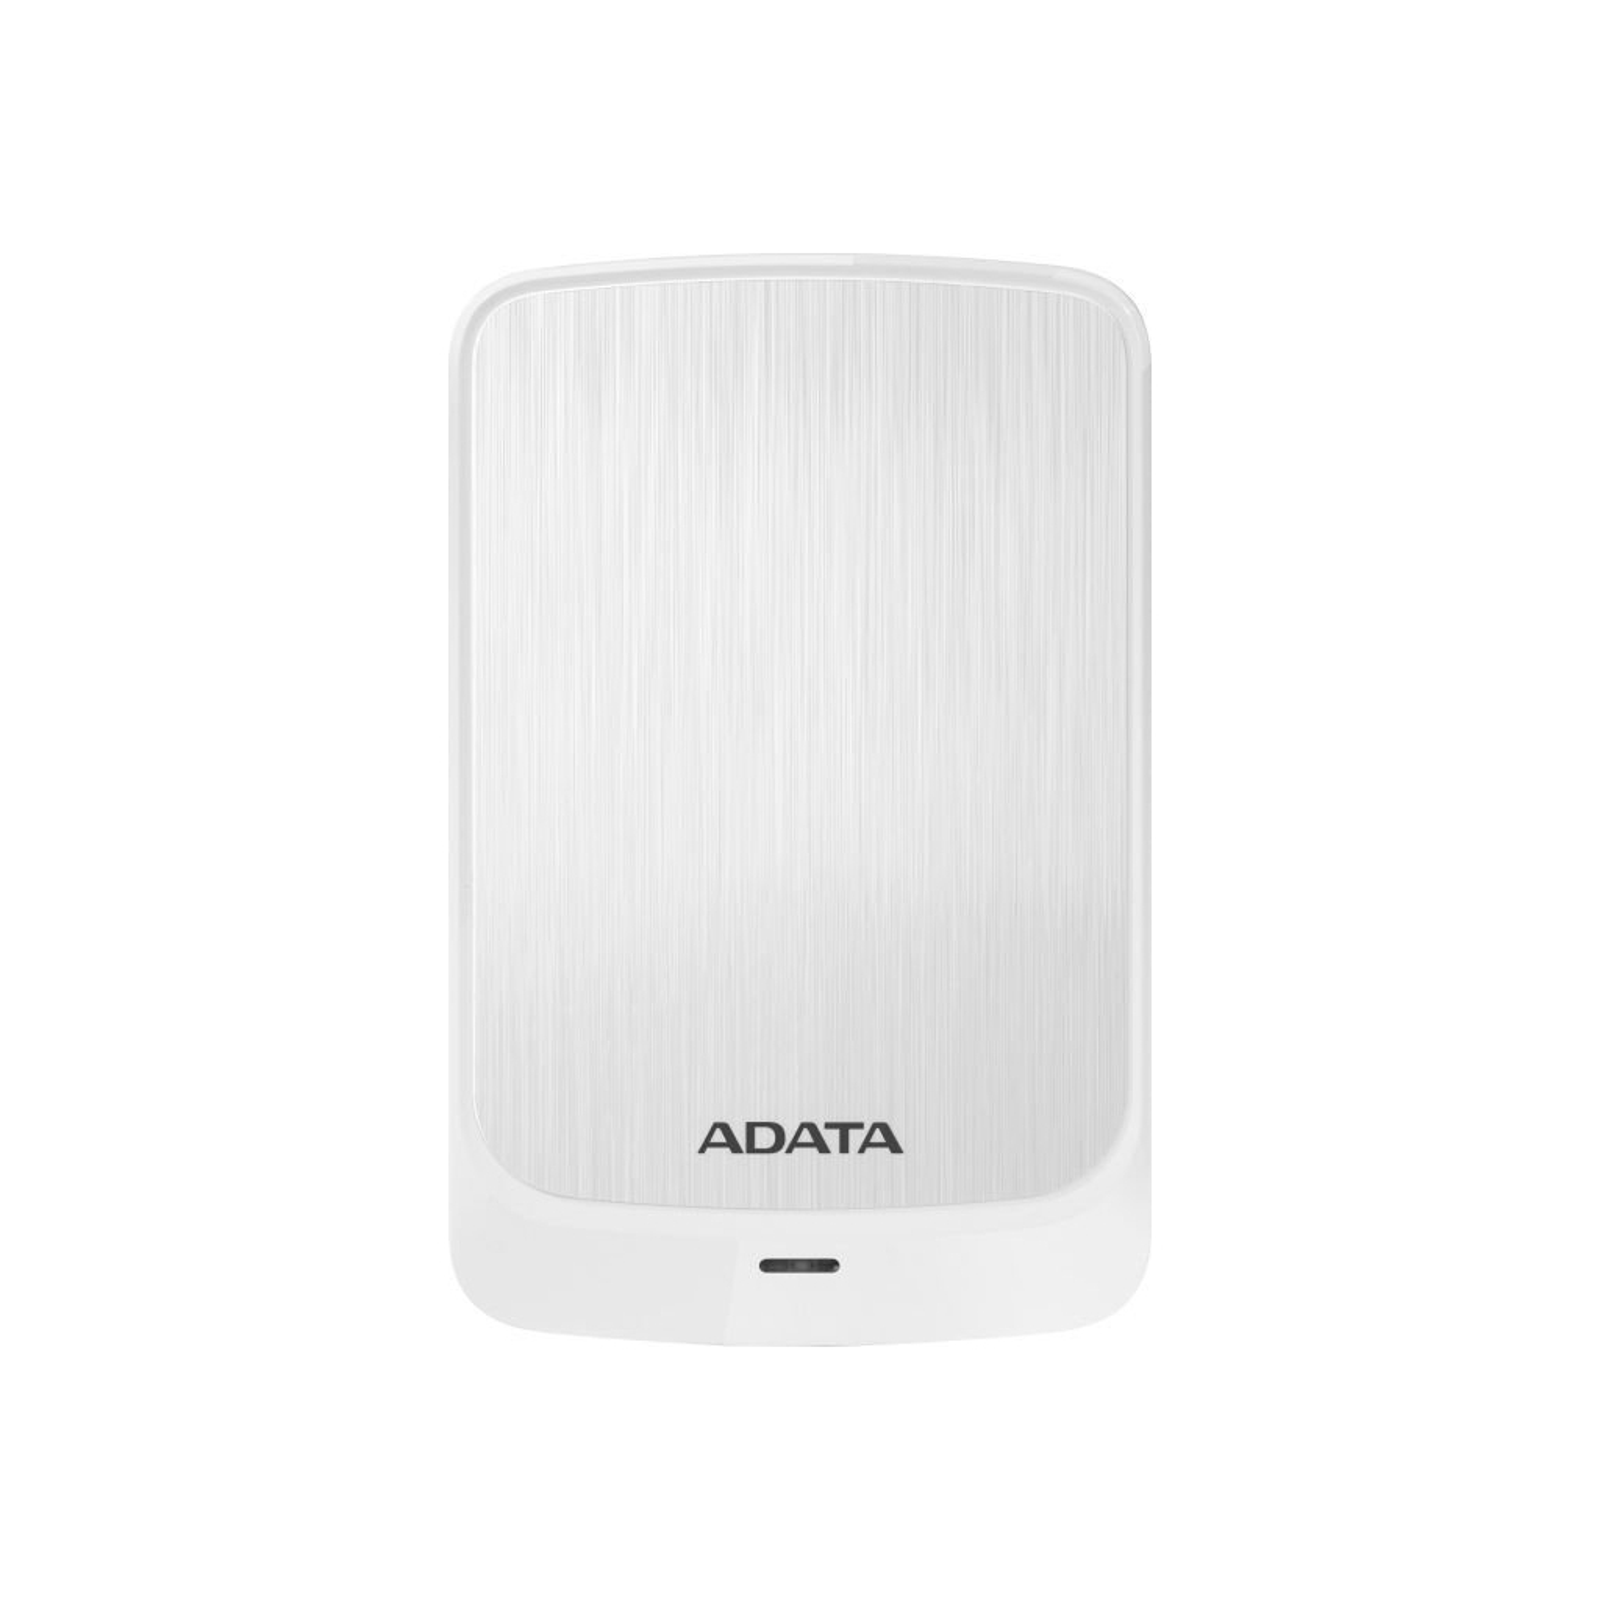 "Внешний жесткий диск 2.5"" 4TB ADATA (AHV320-4TU31-CWH)"